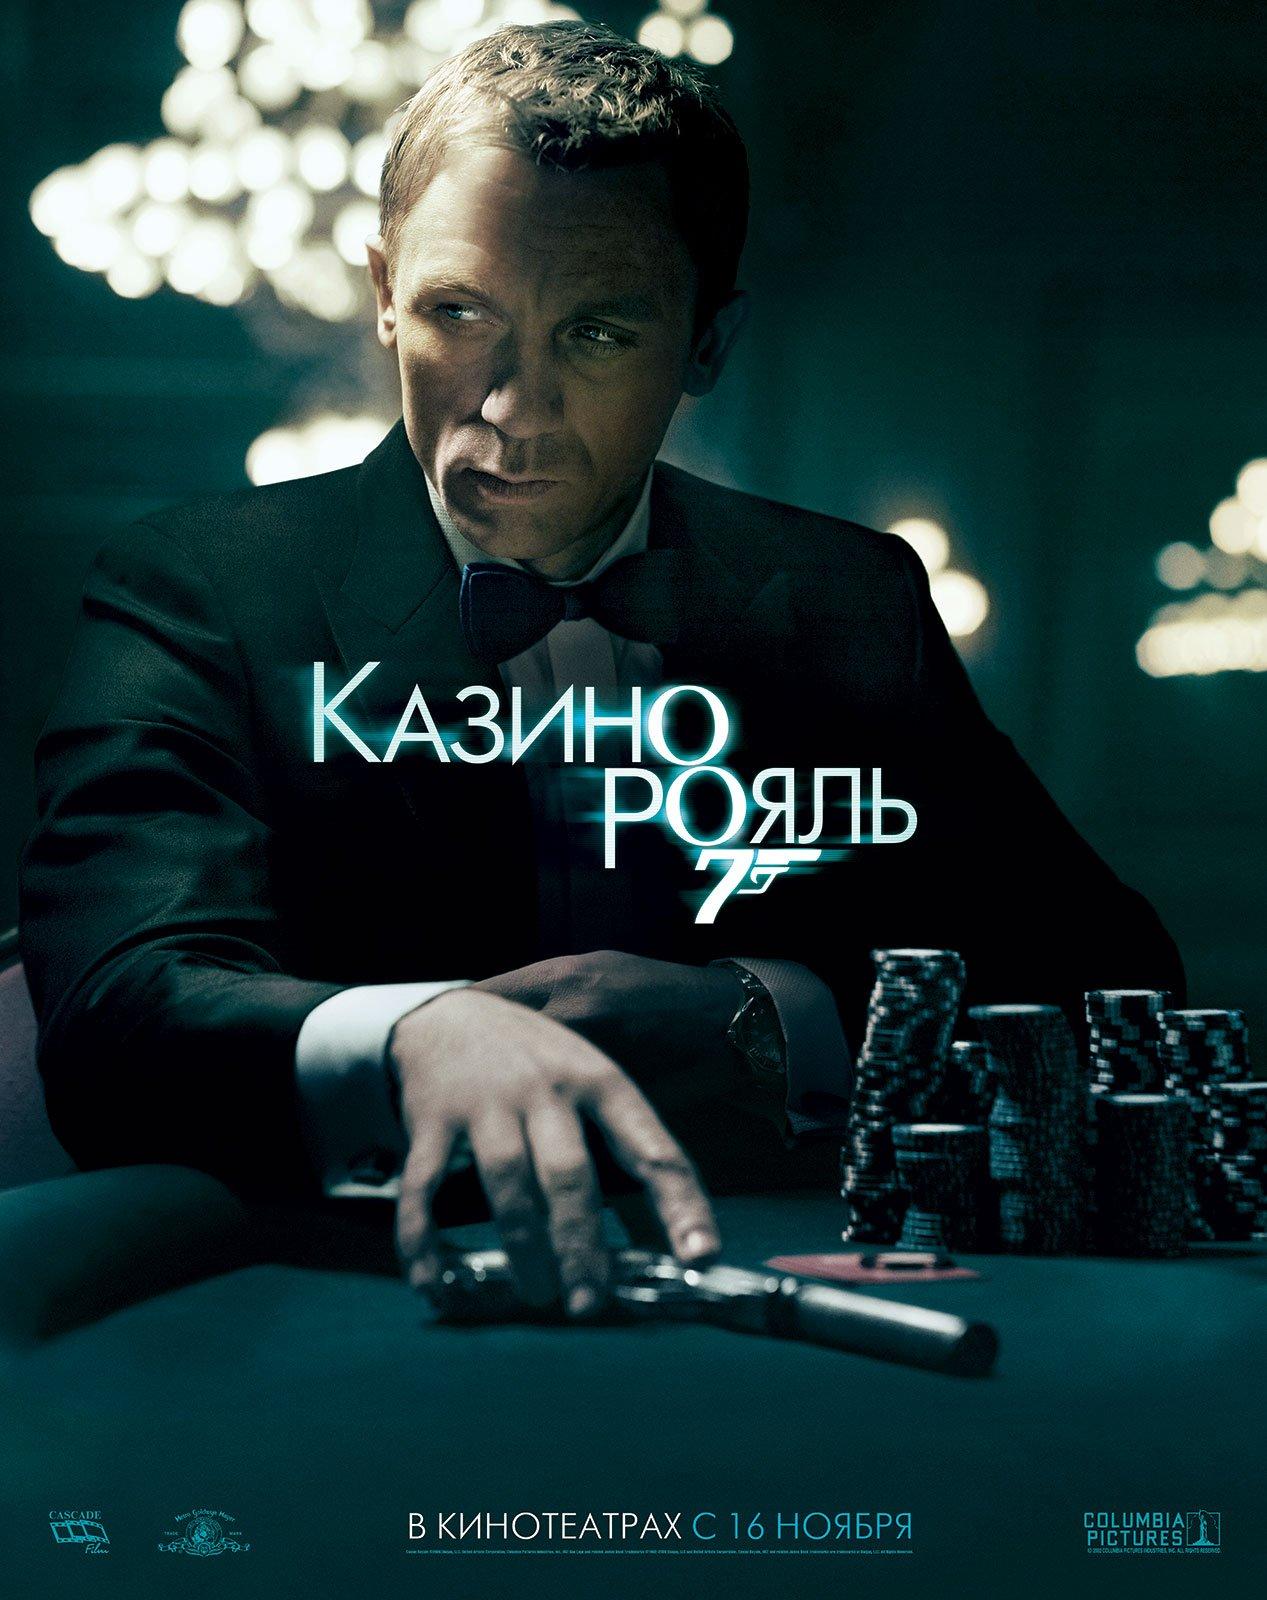 2006 casino film royale wikipedia benefits of legalized gambling